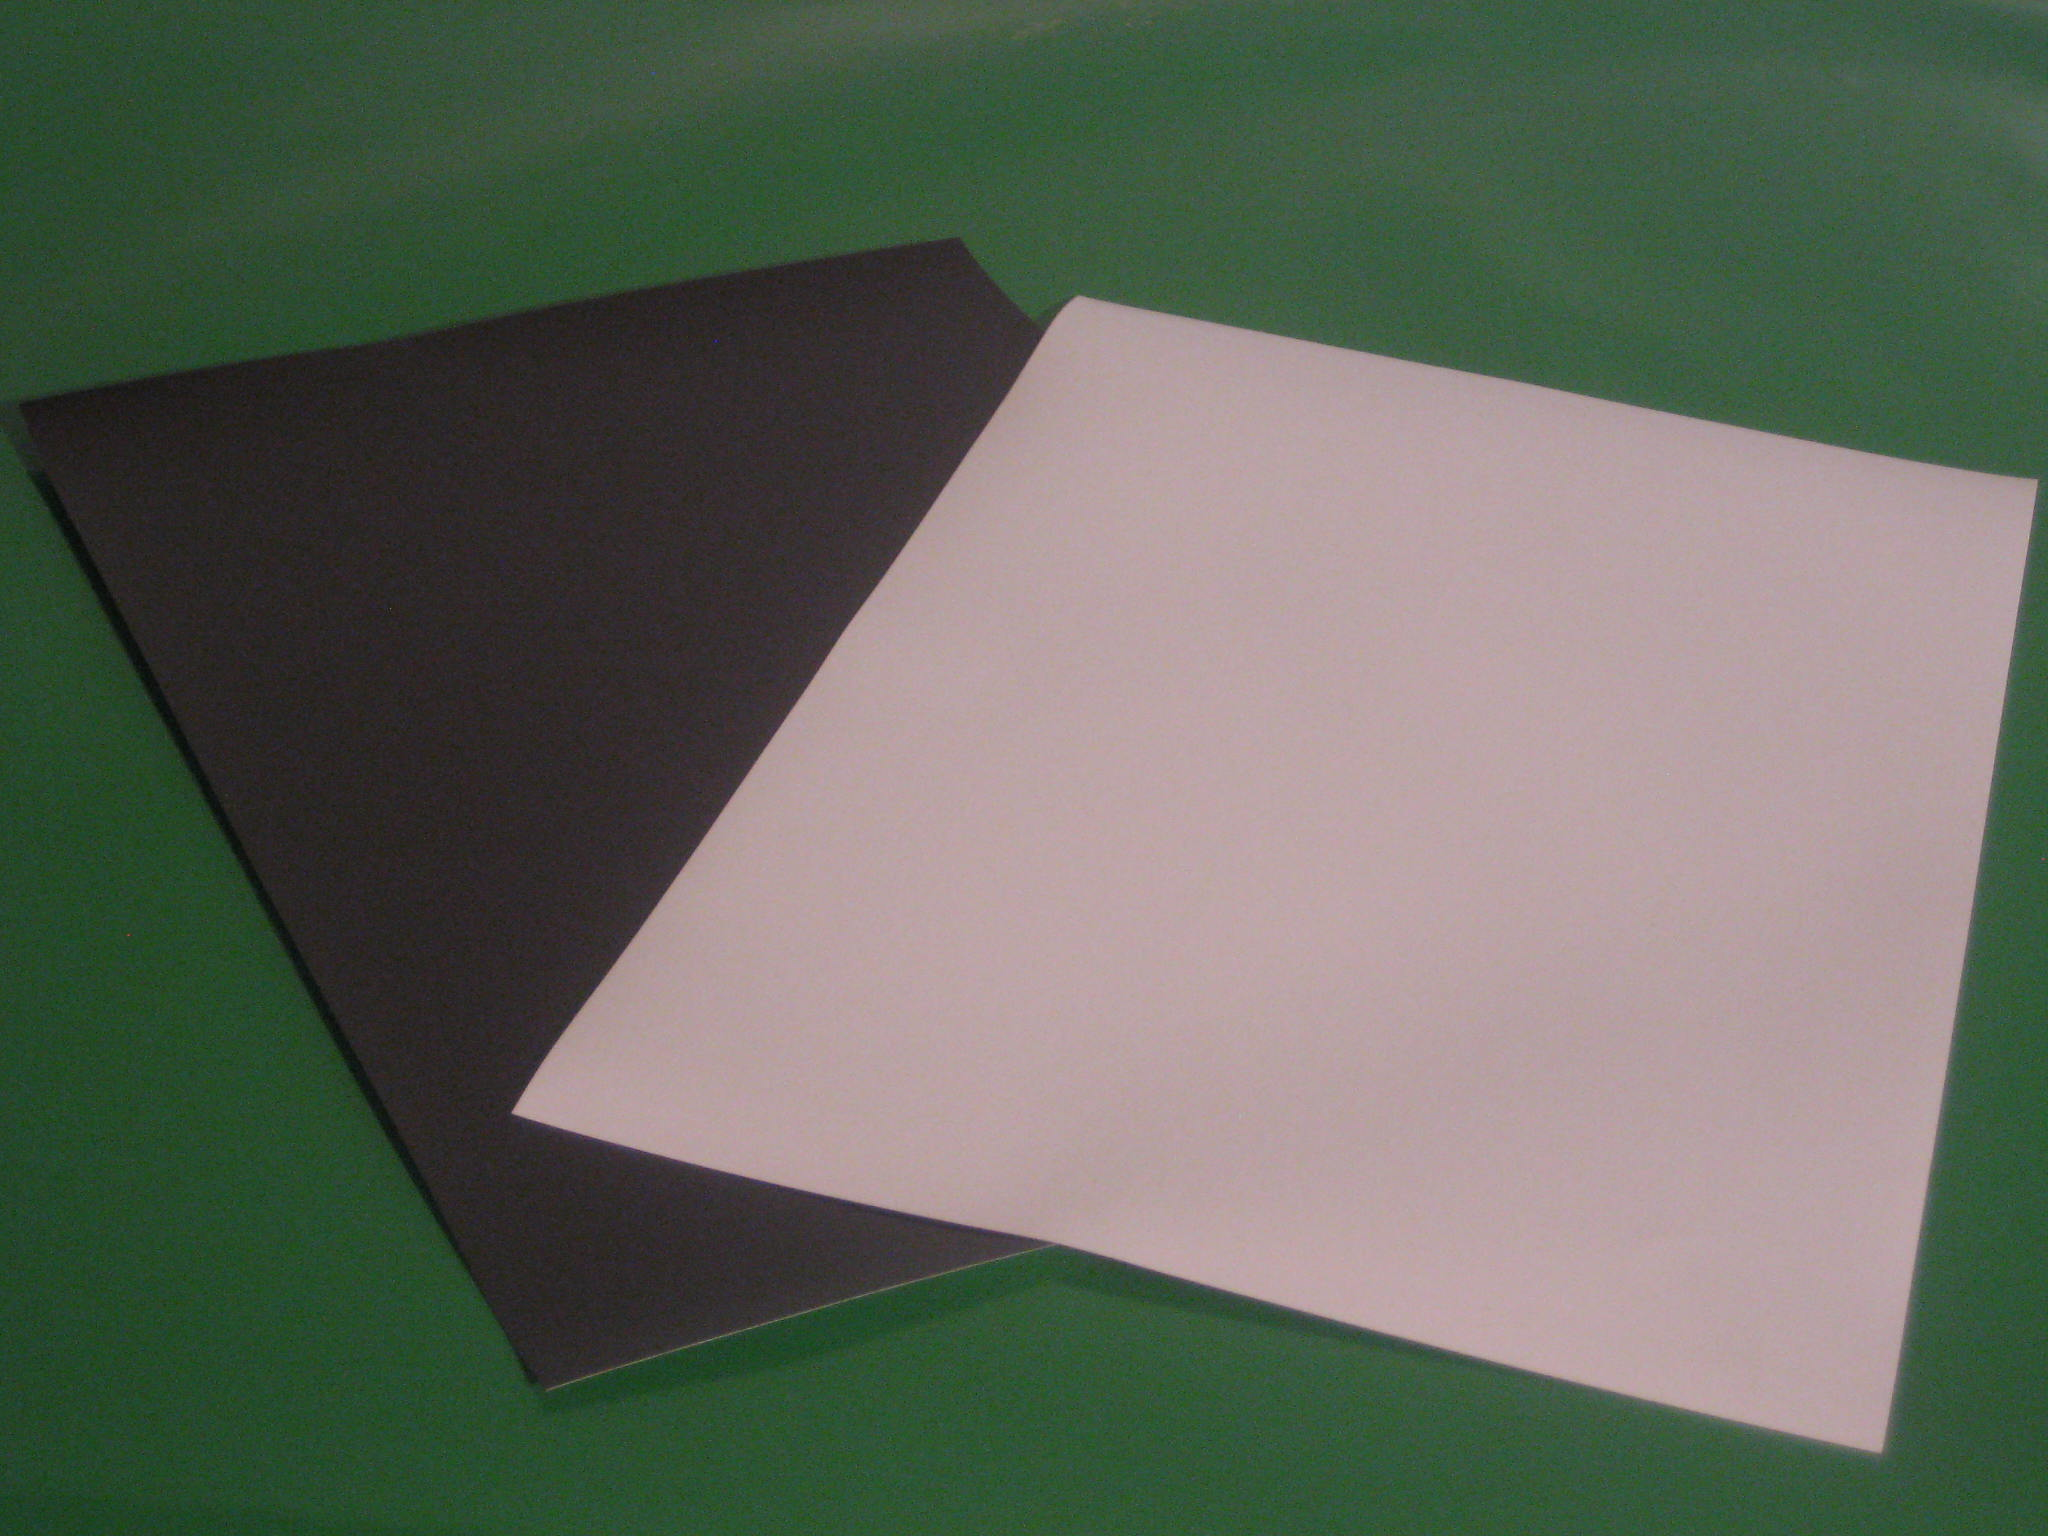 Inkjet Grade Gloss White Magnetic Paper A From Abel Magnets  Abel  Inkjet Grade Gloss White Magnetic Paper A From Abel Magnets  Abel Magnets